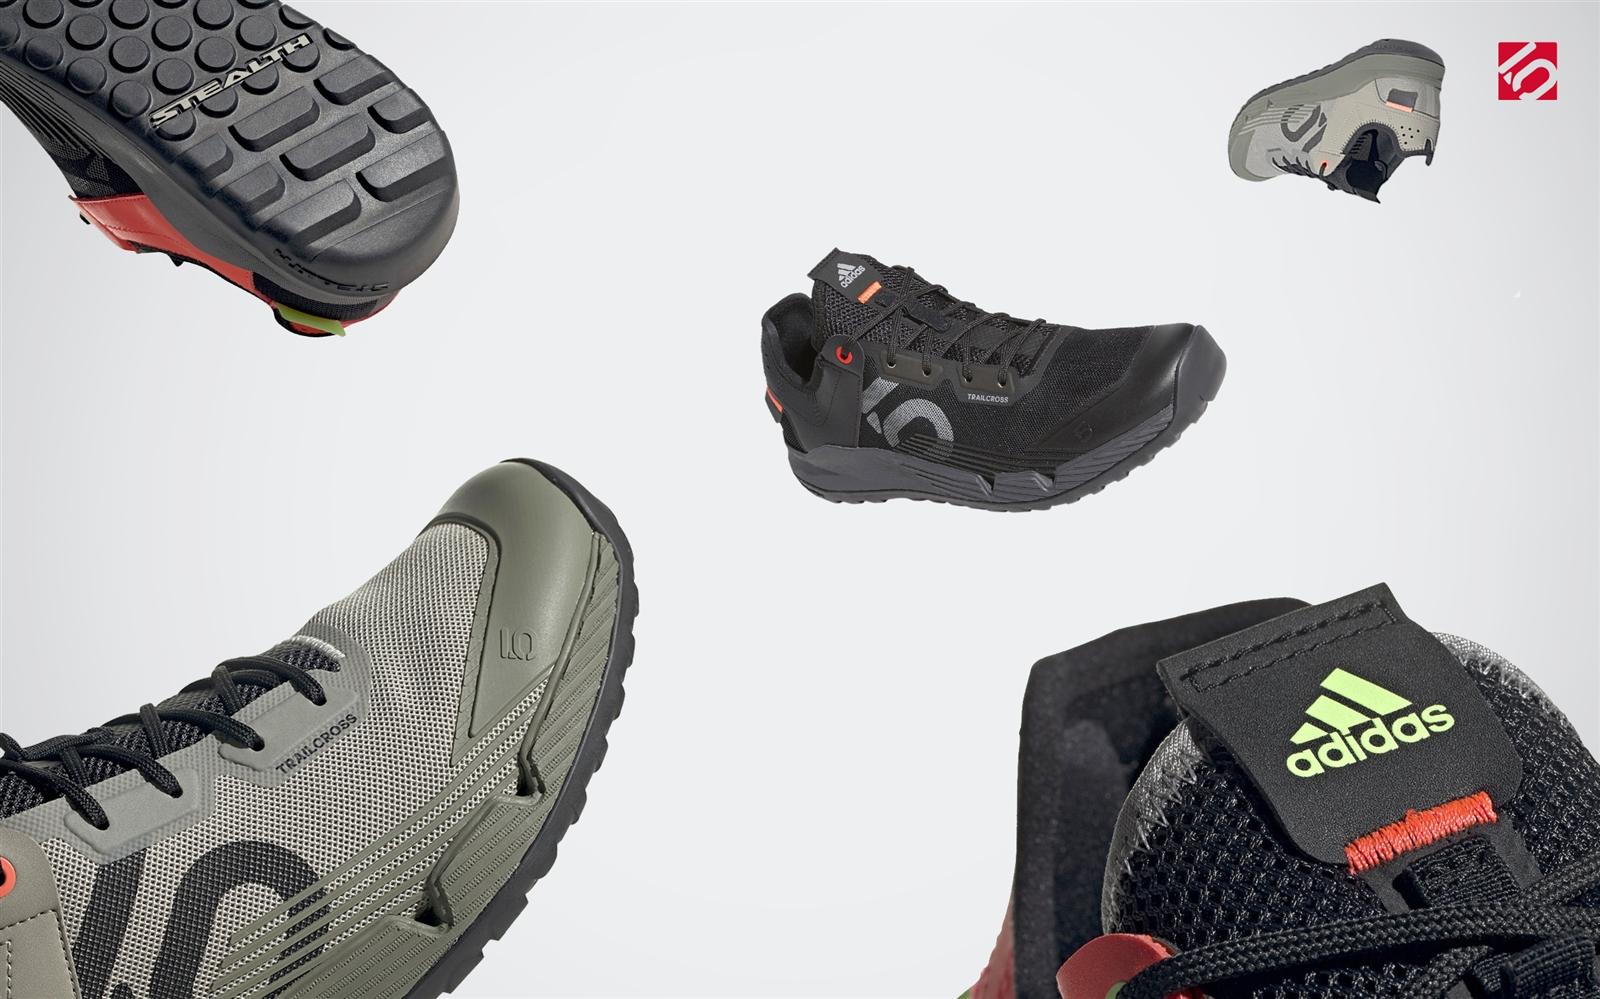 Scarpe MTB Five Ten Trailcross